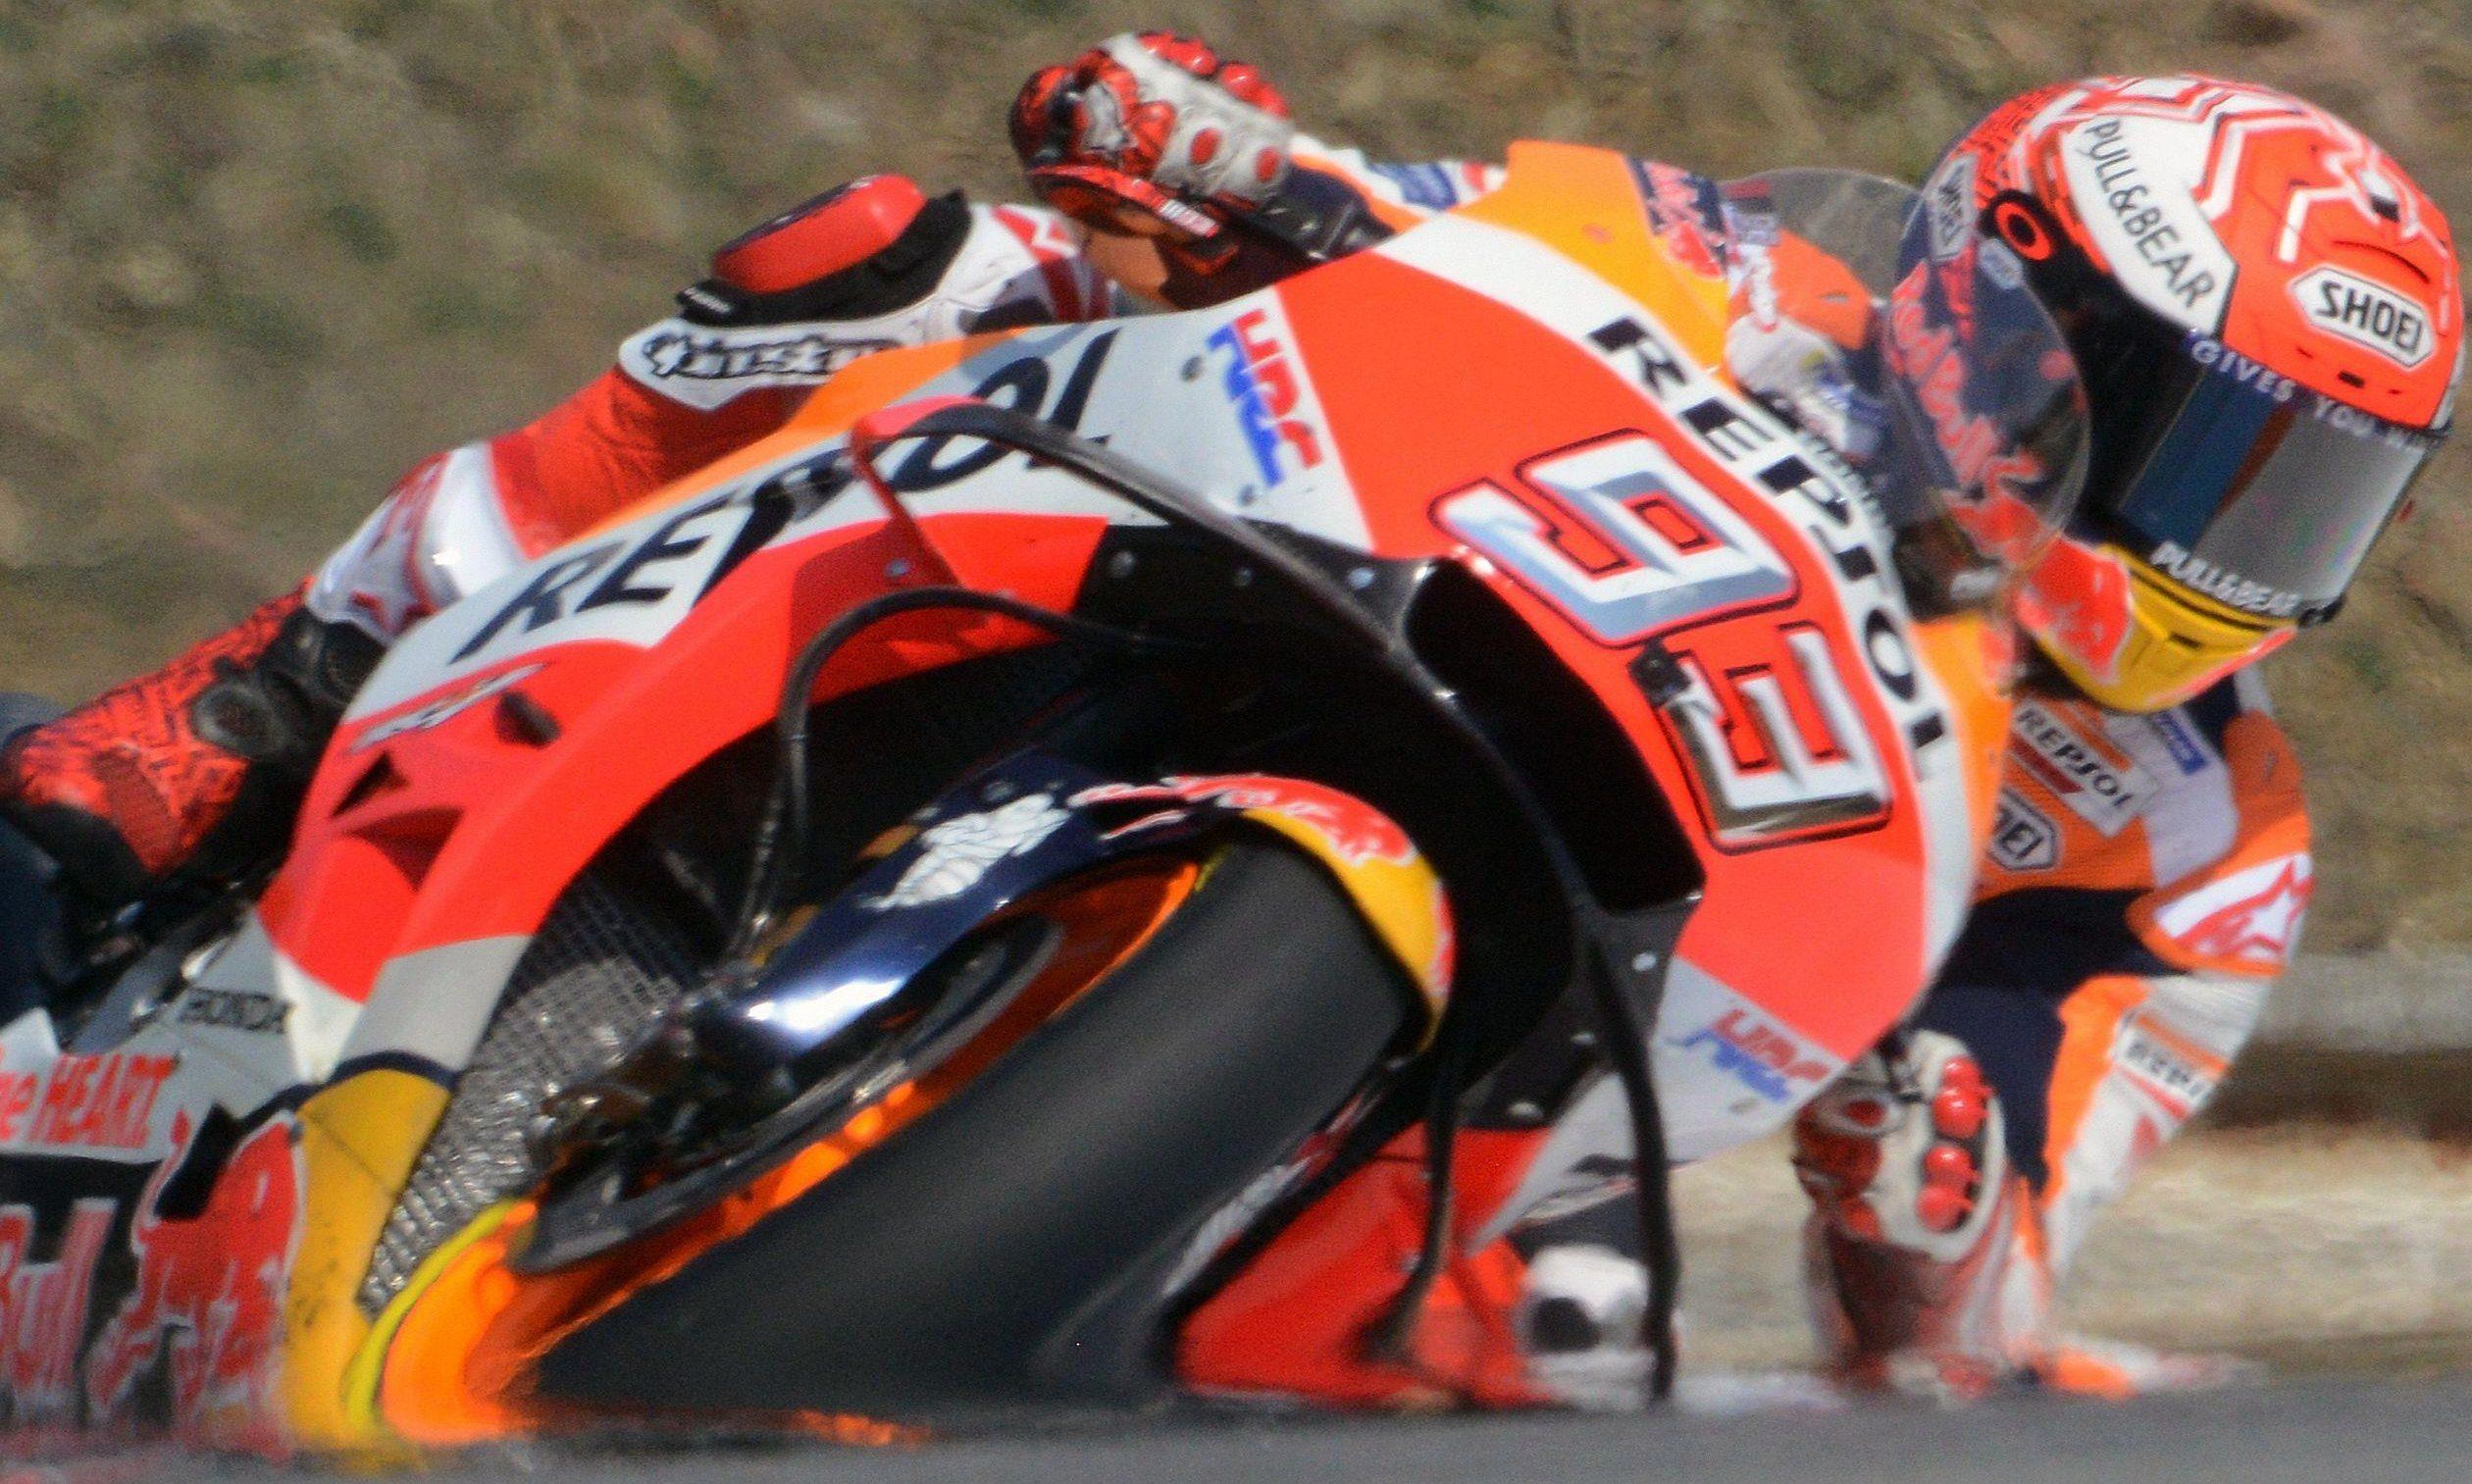 Marquez rides for Honda and has five wins so far this season